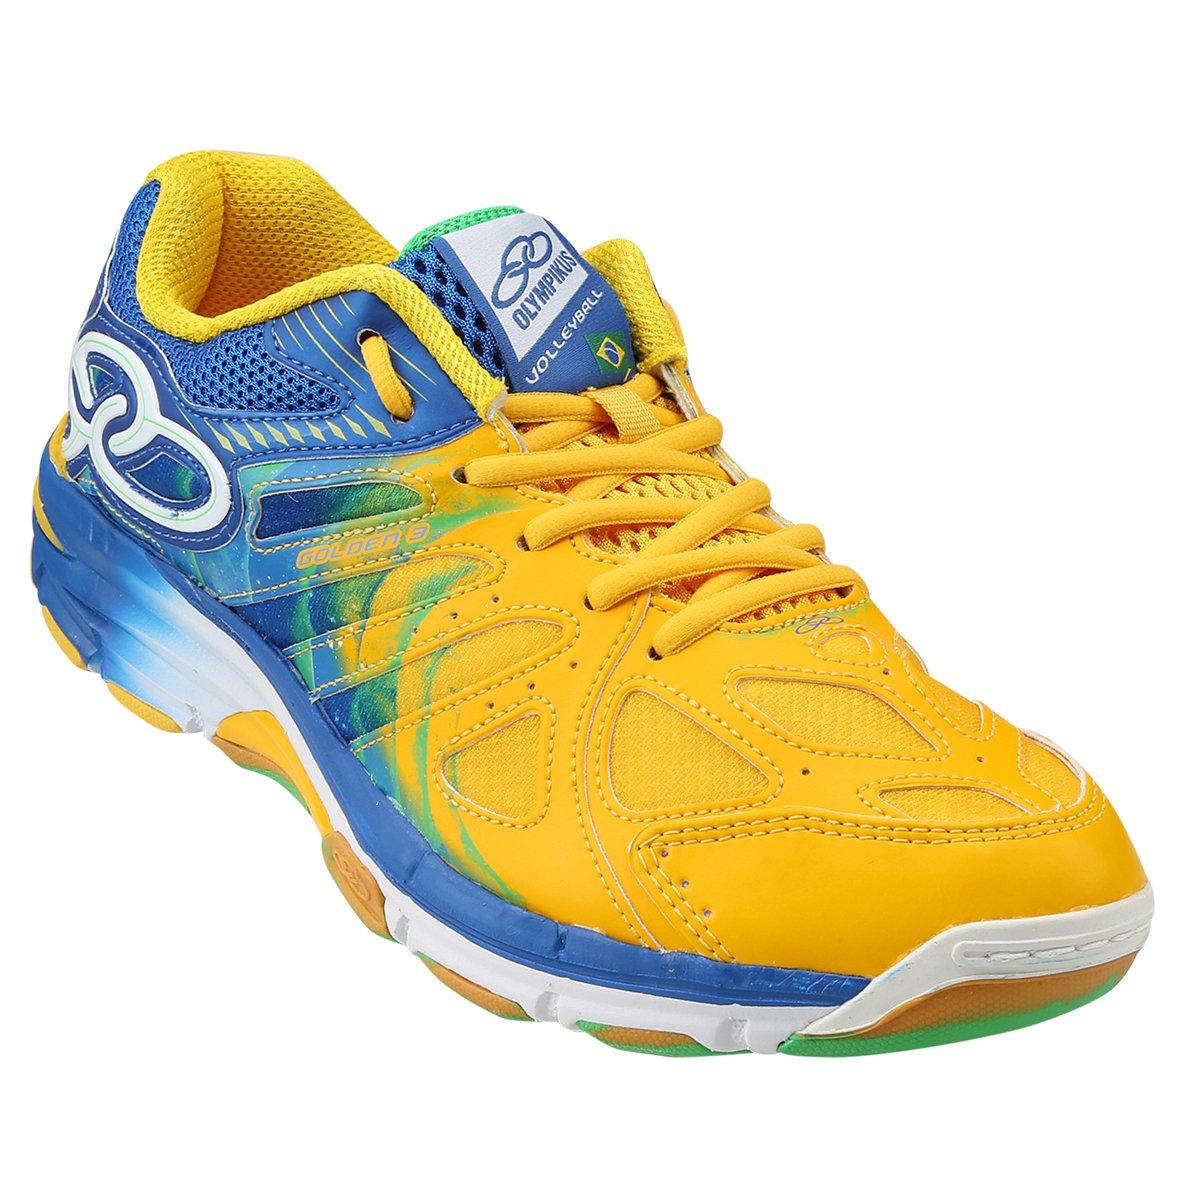 LP Tênis Amarelo e 3 Golden Tênis Olympikus Azul Golden Olympikus xYawHFfq